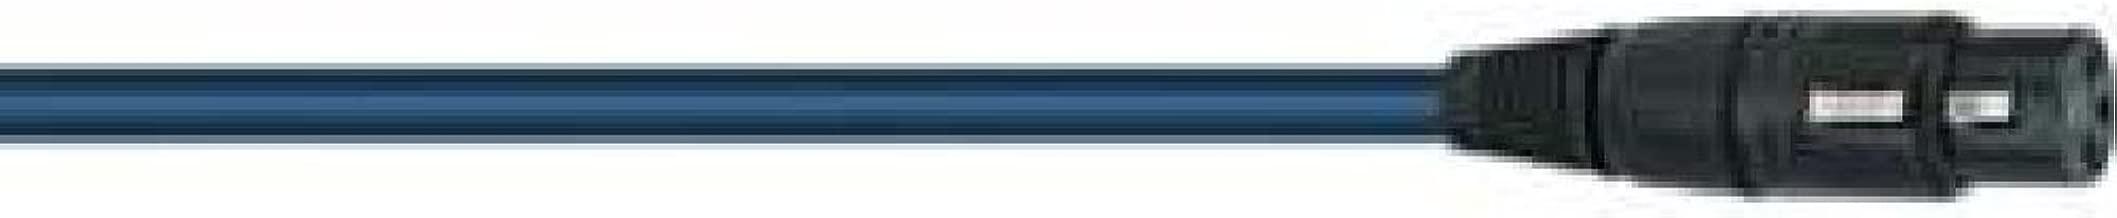 WIREWORLD Oasis 7 XLR Cable (2.0m) OBI7BAL/2.0m Japan Used Like New